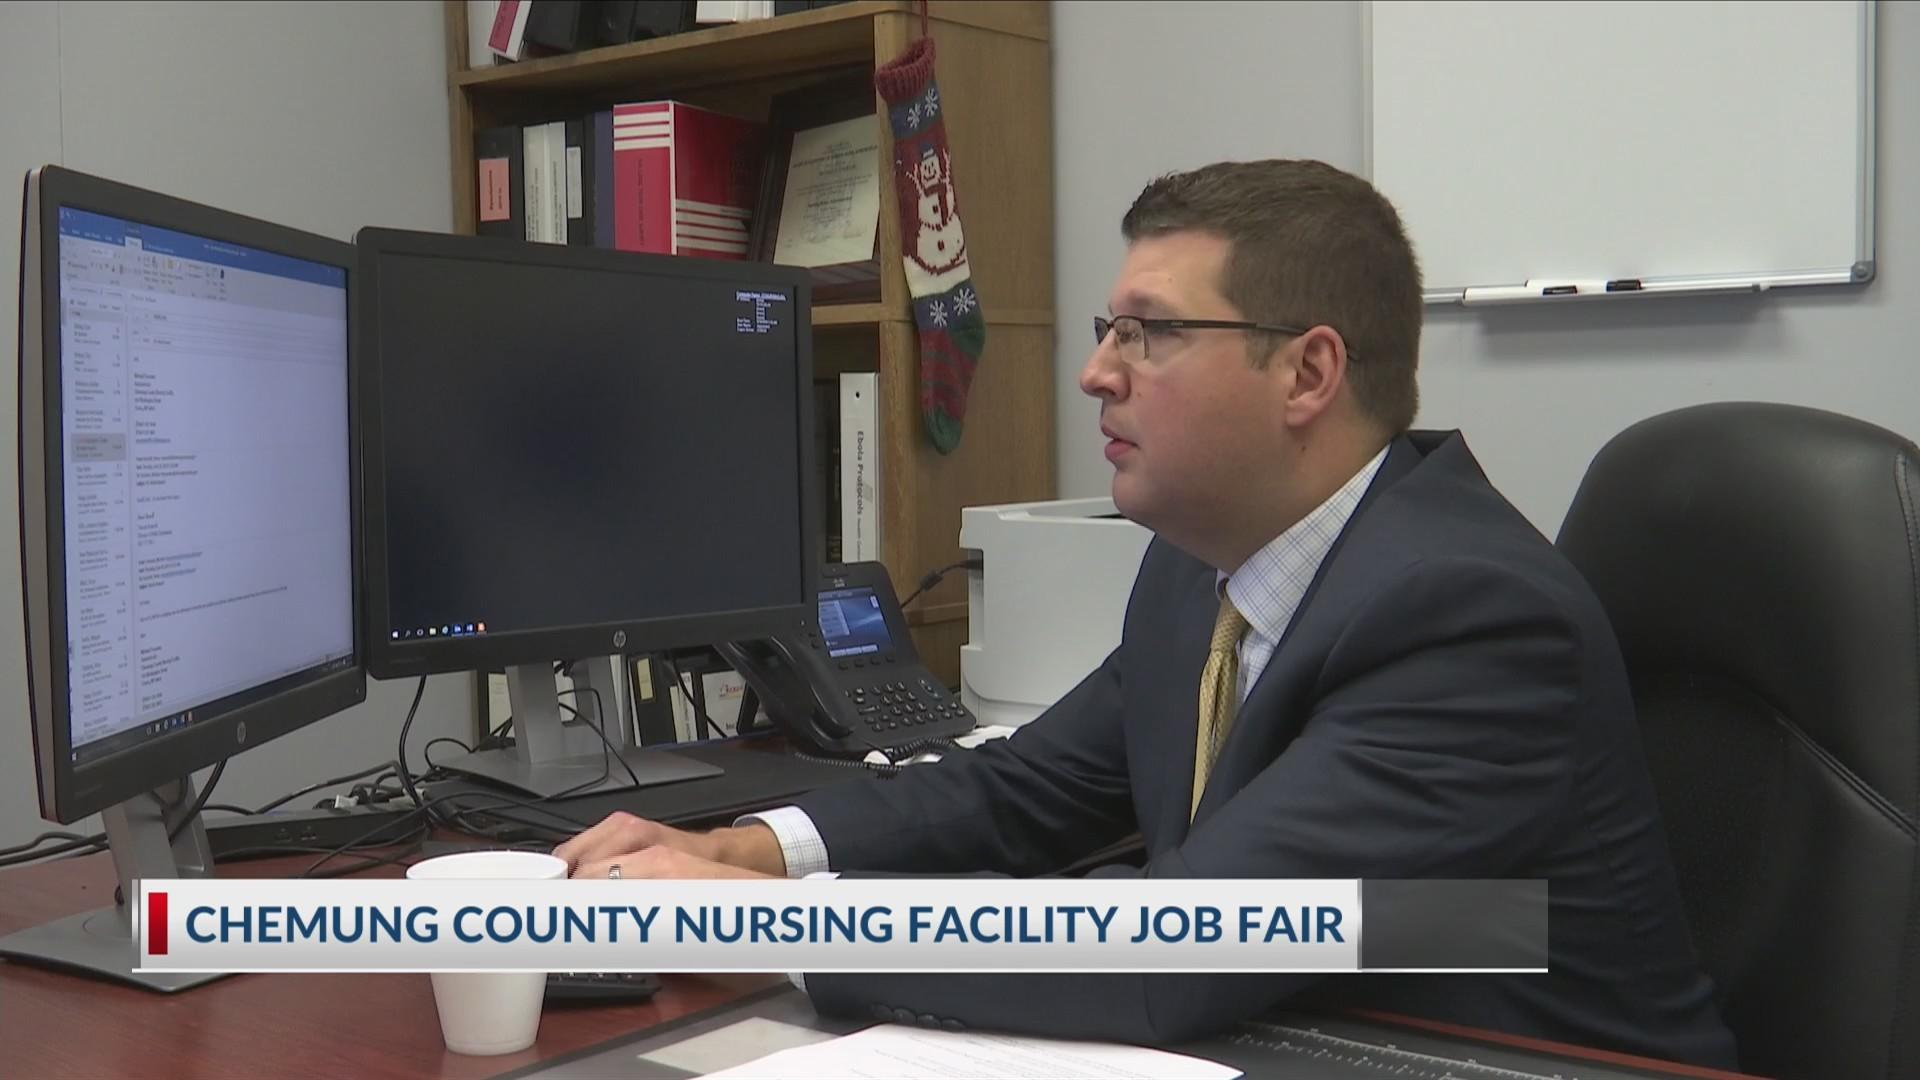 Chemung County Nursing Facility Job Fair